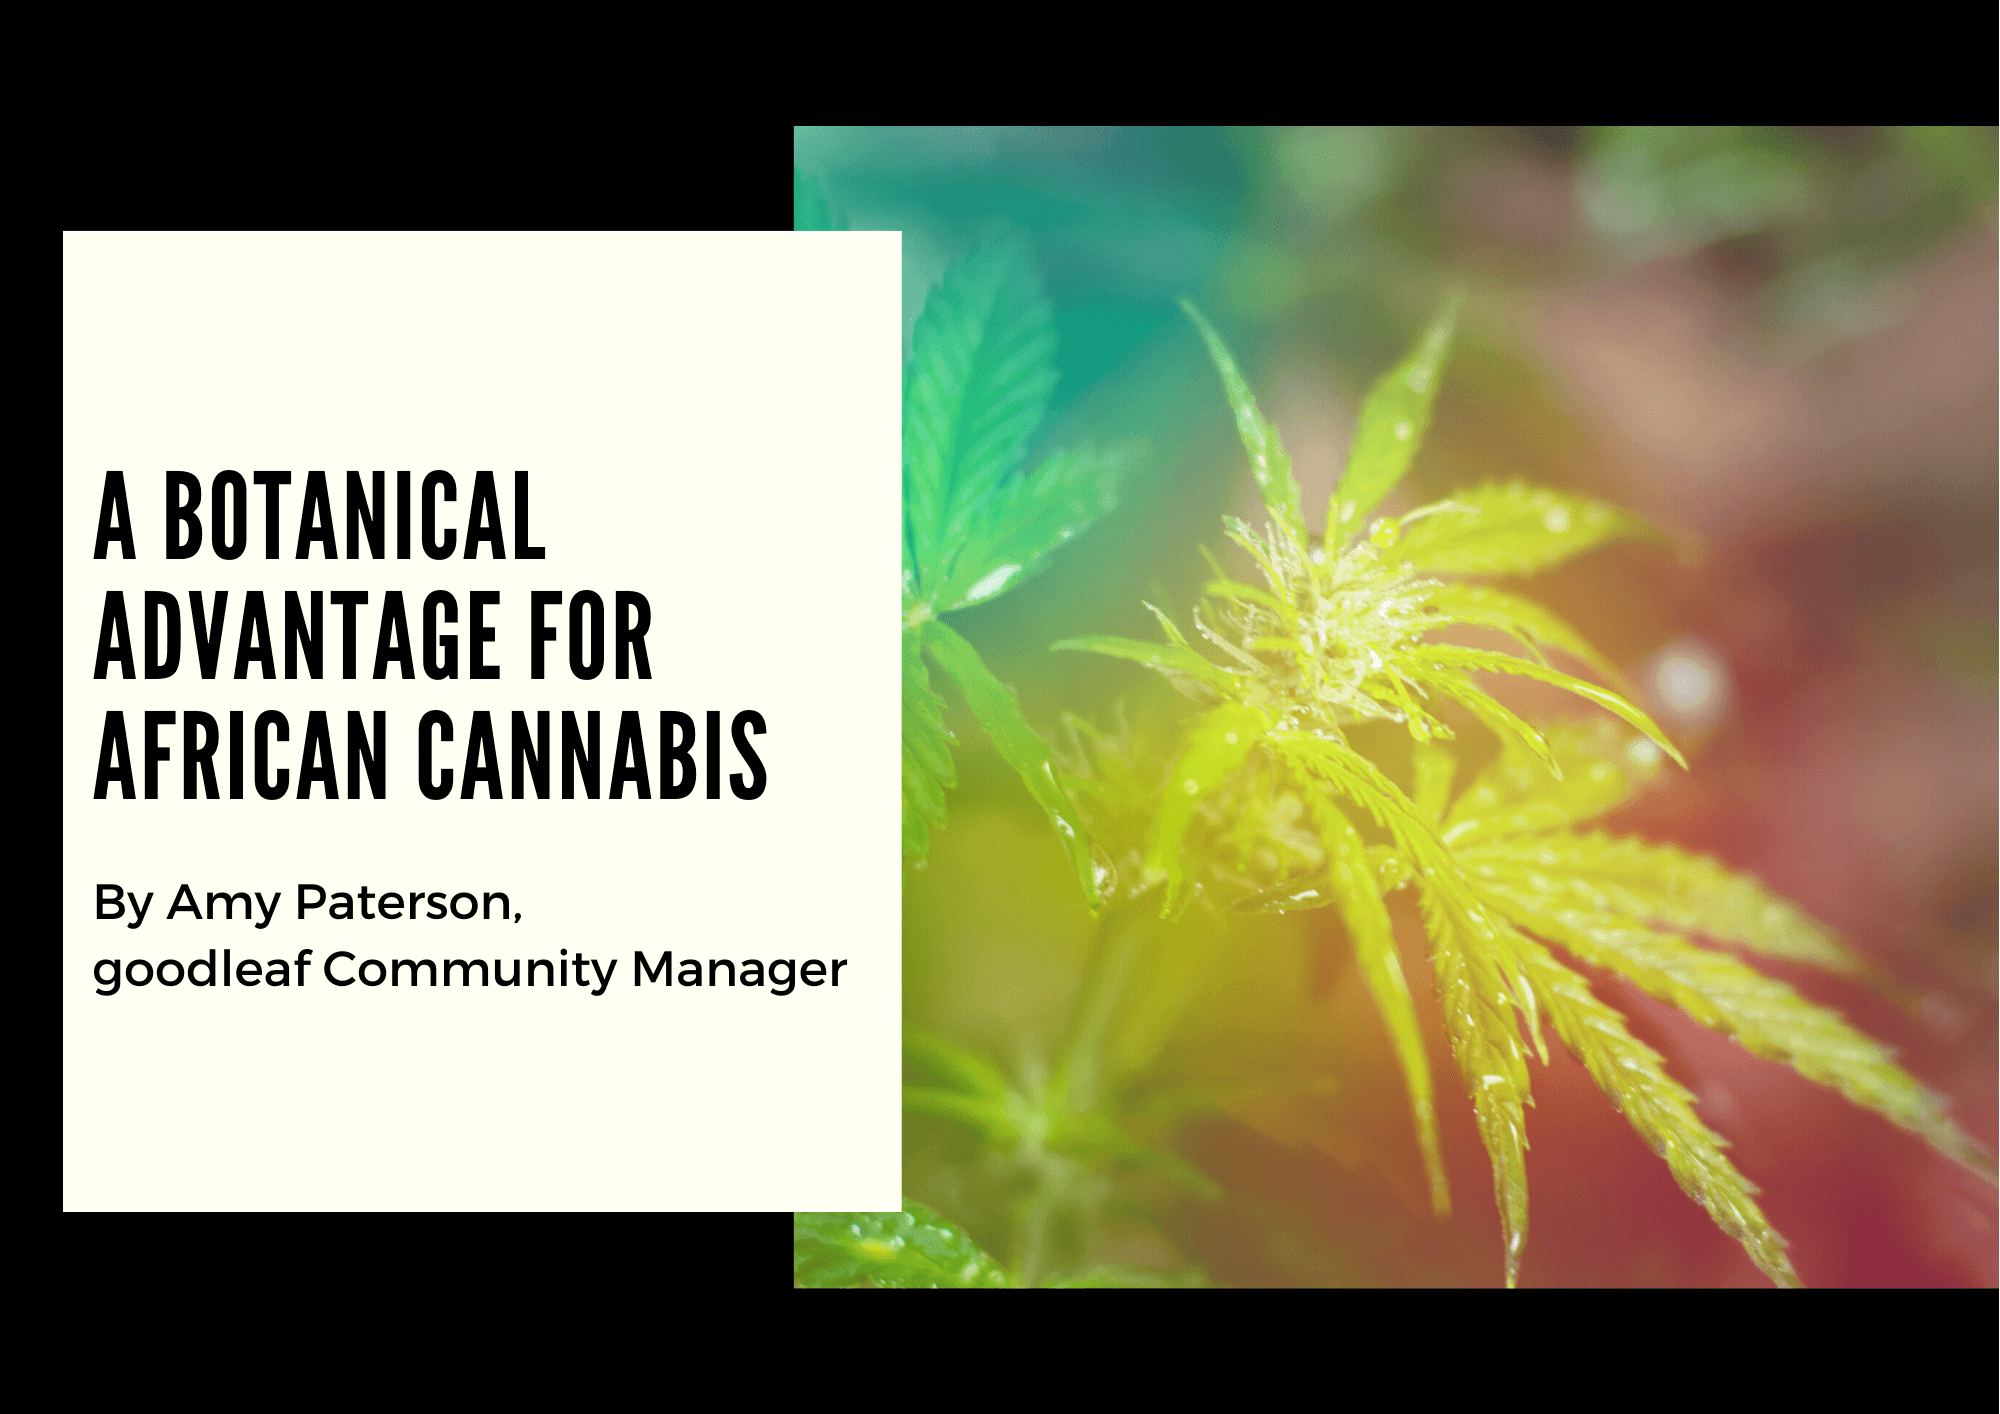 @saul.kaye's cover photo for 'goodleaf Presents: A Botanical Advantage for African Cannabis | Canna Tech Global'